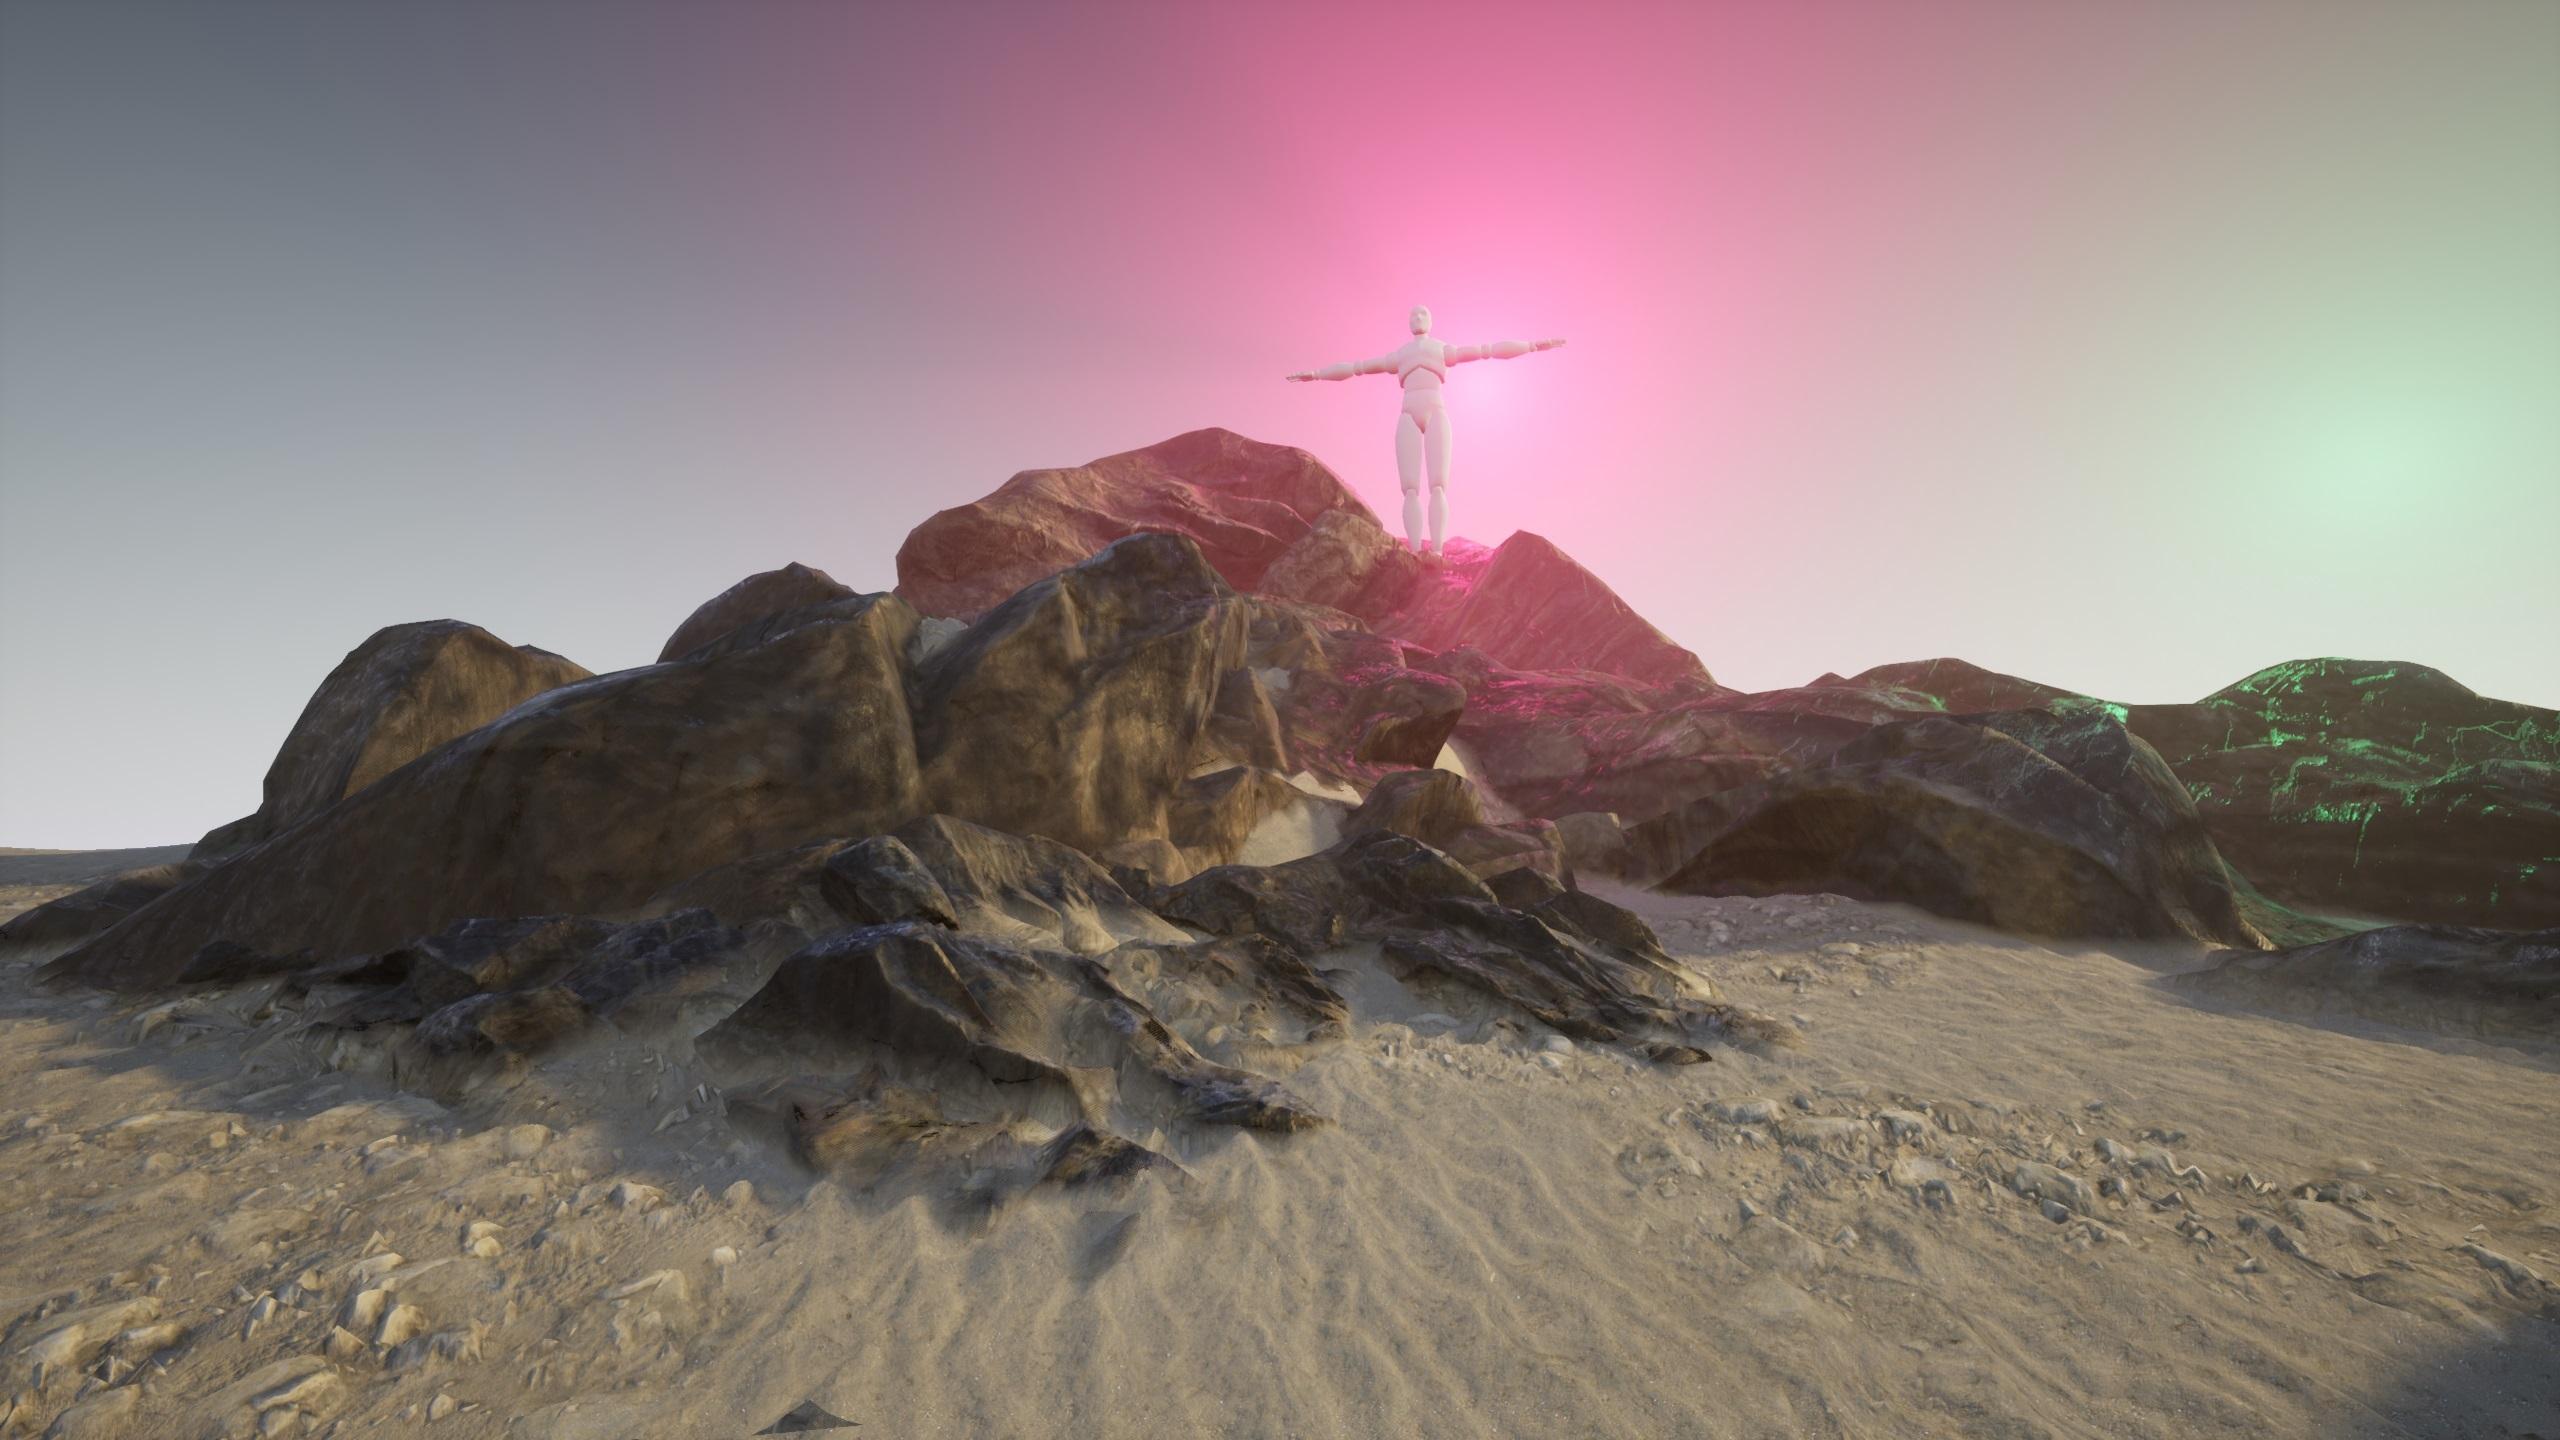 UE4 Terrain Blending: Part 1, Distance Fields - How, why